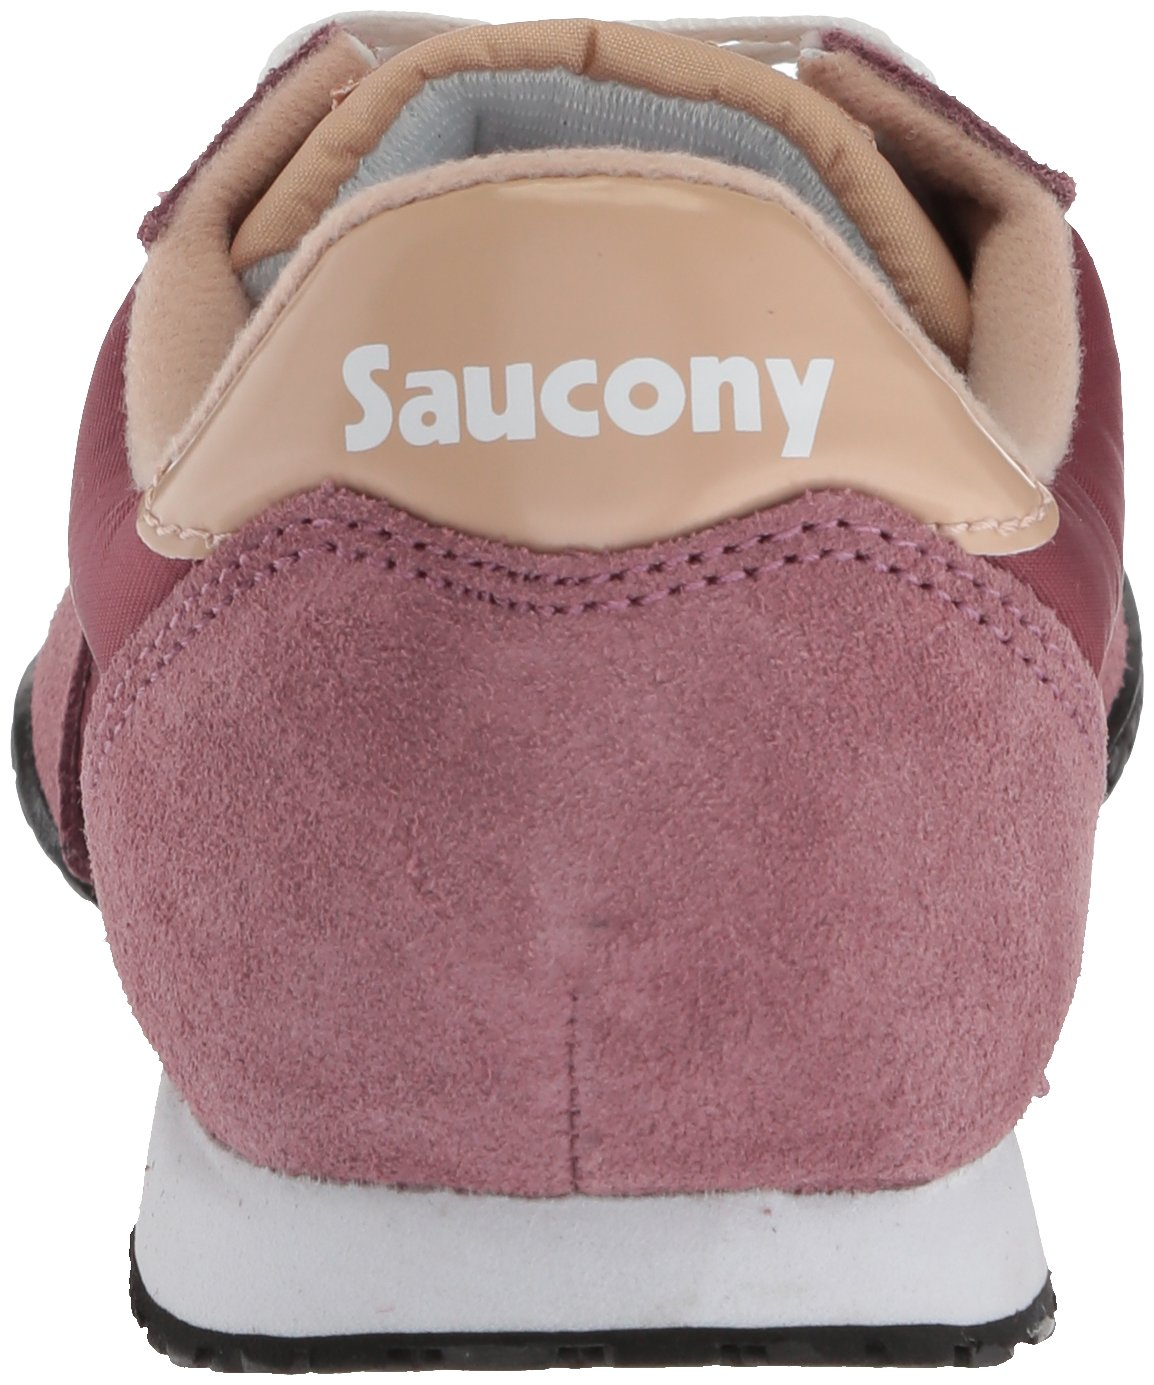 Saucony Originals Women's Bullet B(M) Sneaker B071G1JFT6 7 B(M) Bullet US|Maroon/Tan 6ddba3